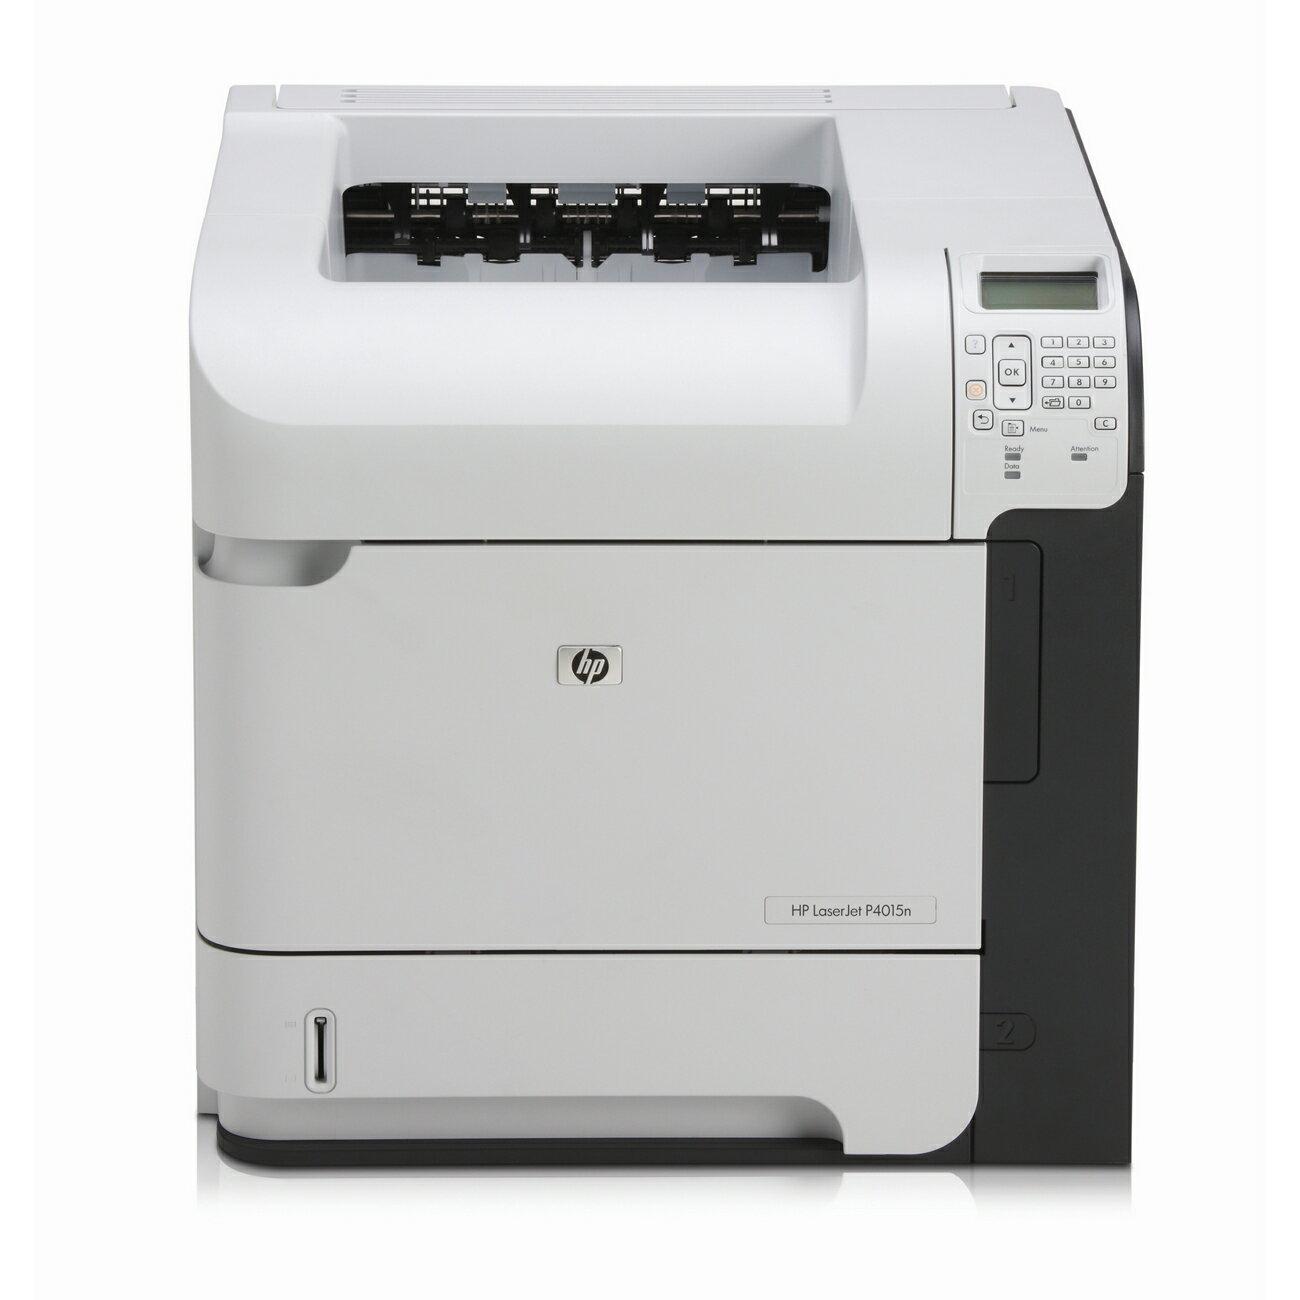 HP LaserJet P4015TN Printer - Monochrome - 1200 x 1200 dpi - USB, Network - Gigabit Ethernet - PC, Mac 0